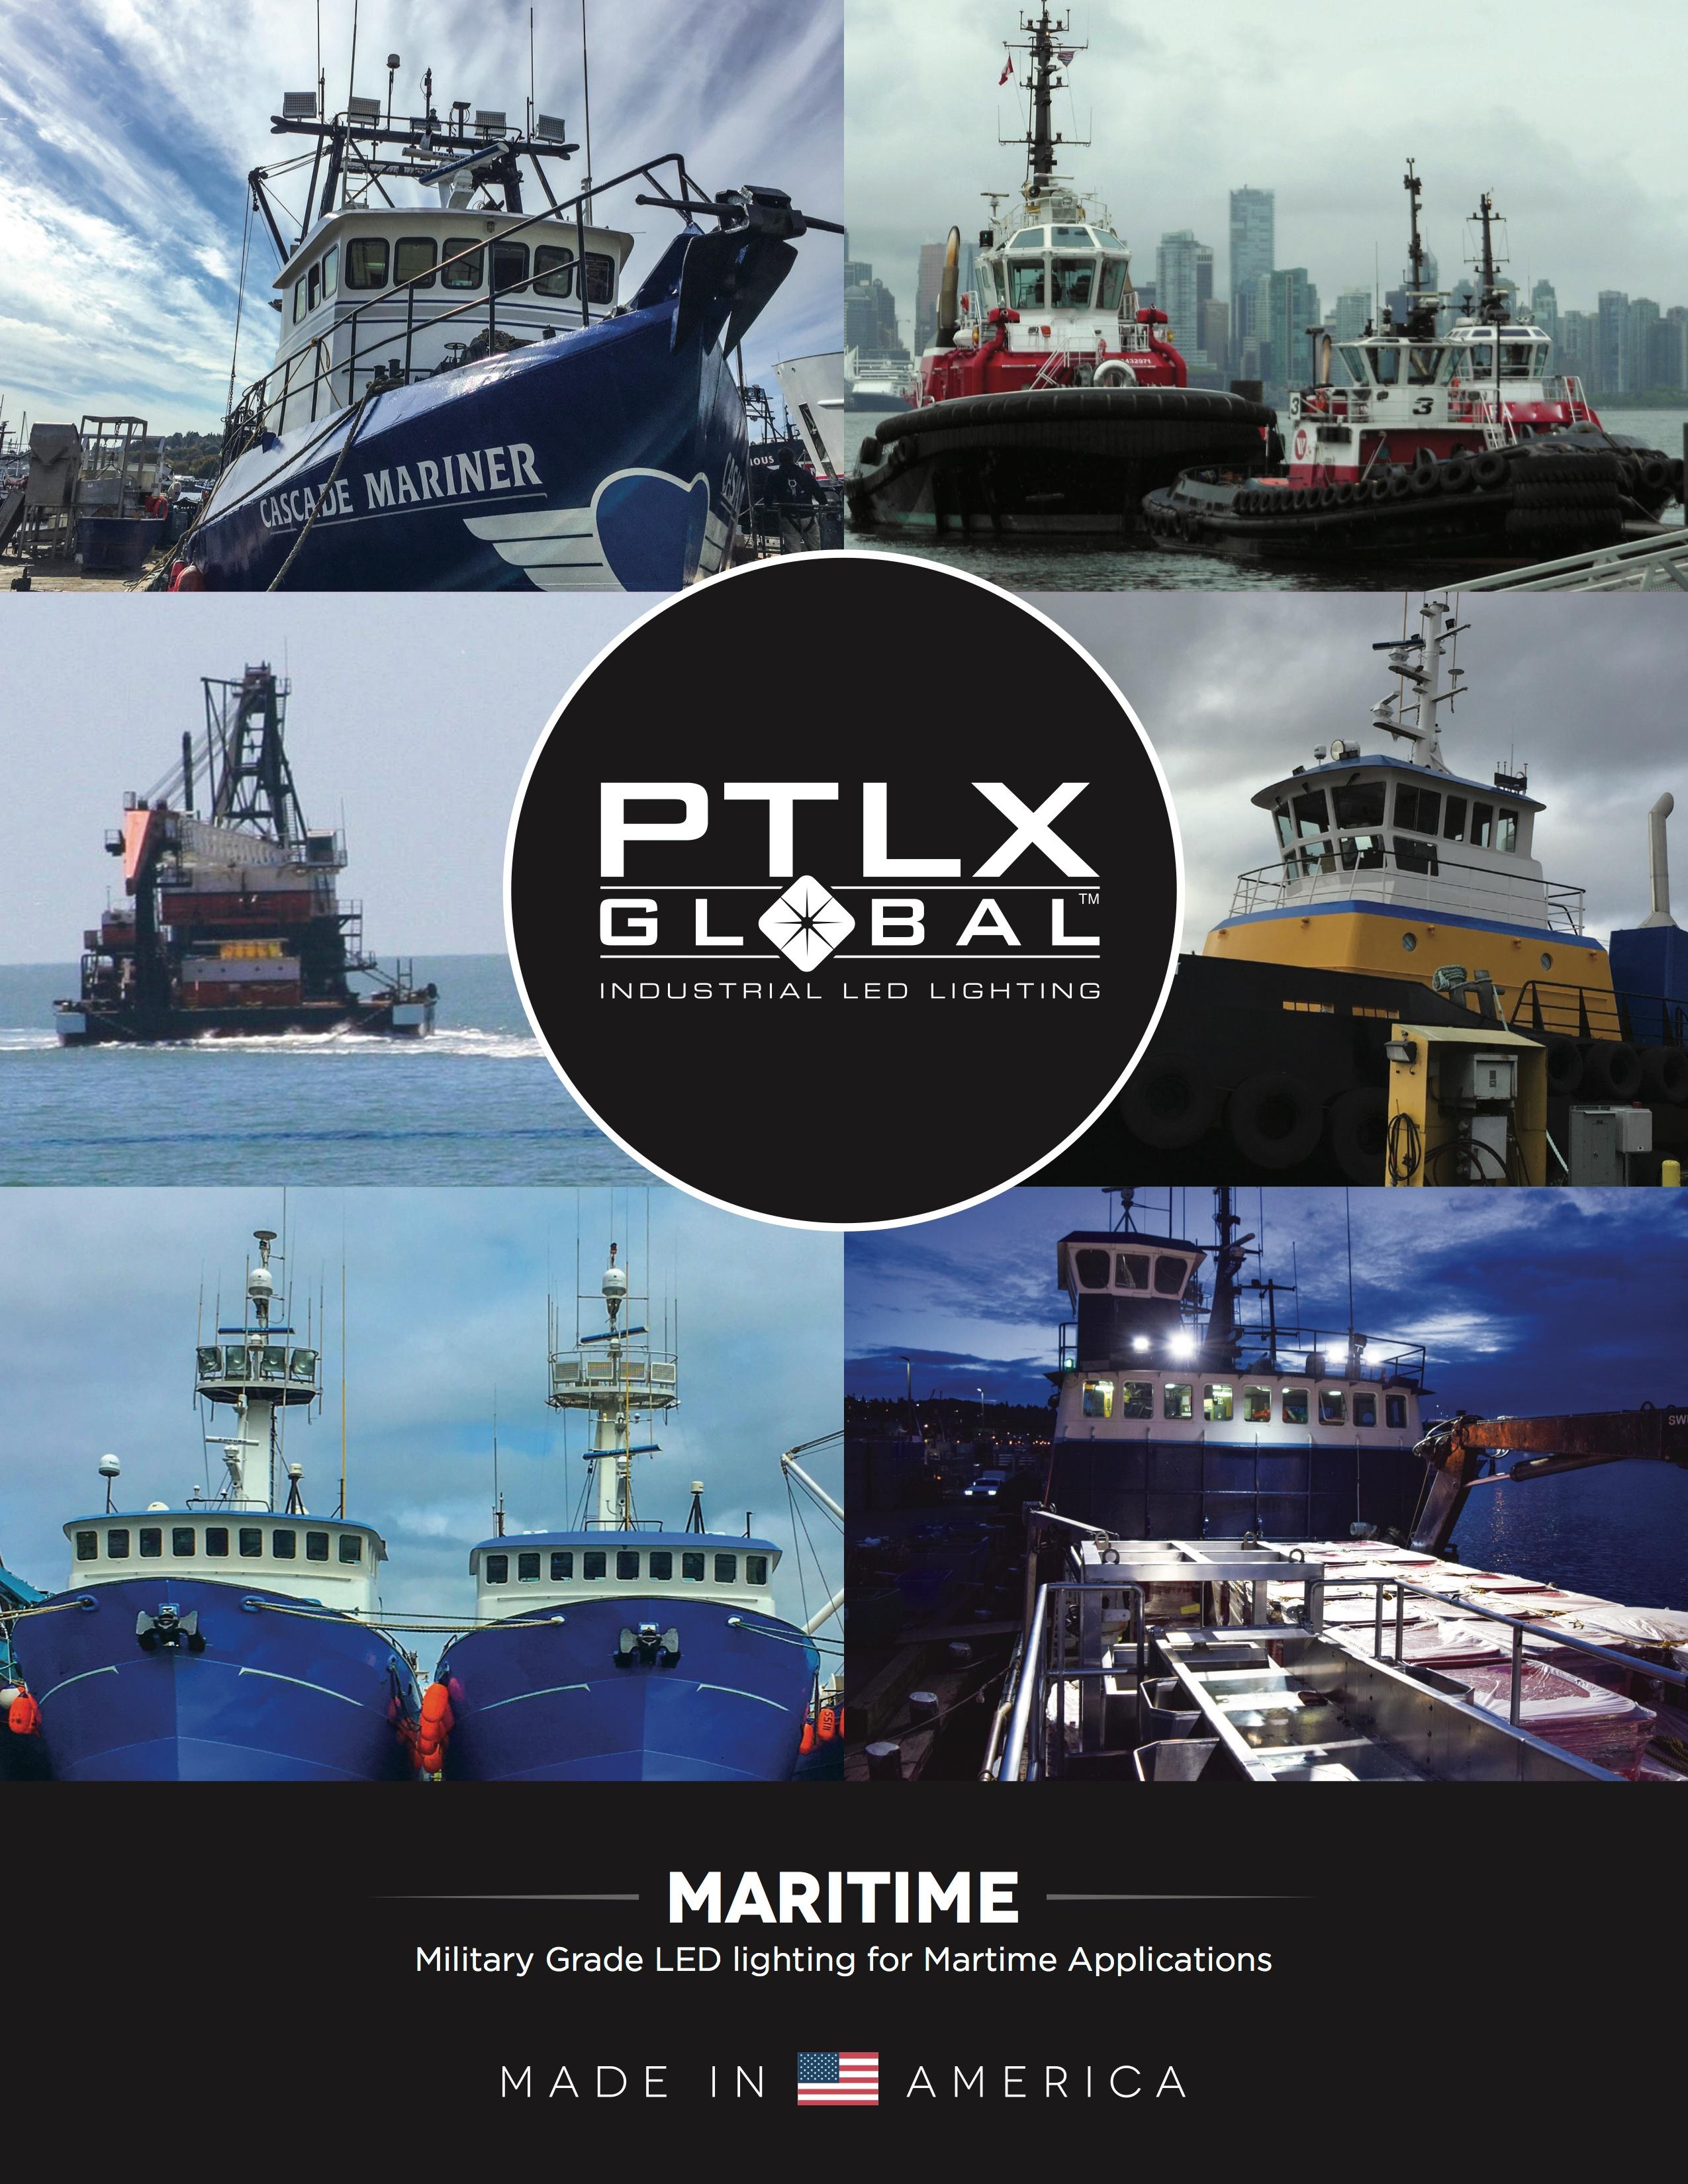 PTLX Marine Brochure 2017 Cover.jpg